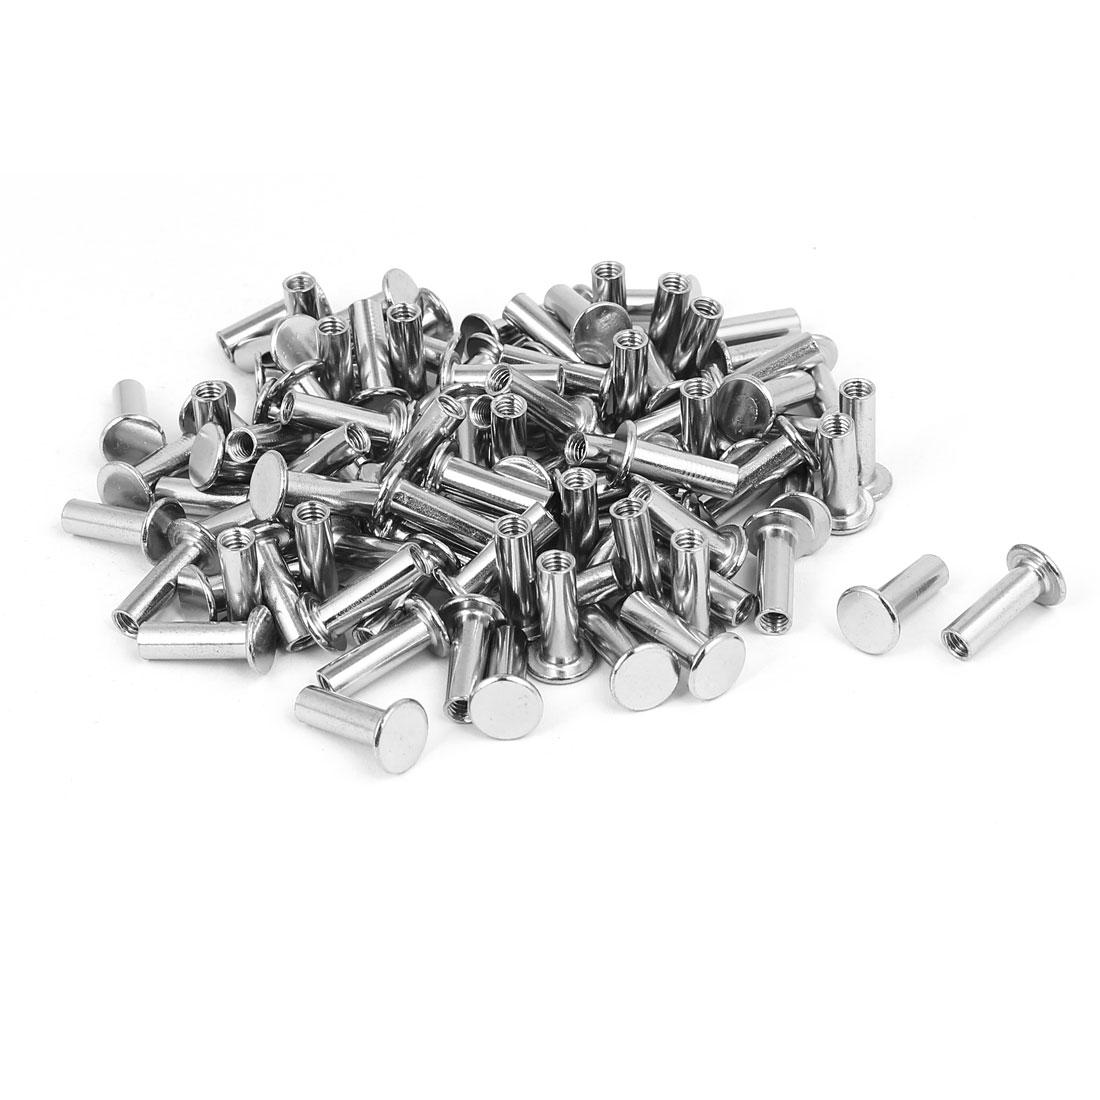 Photo Album Metal Nickel Plated Binding Screw Post Barrel Nut M5x18mm 100pcs